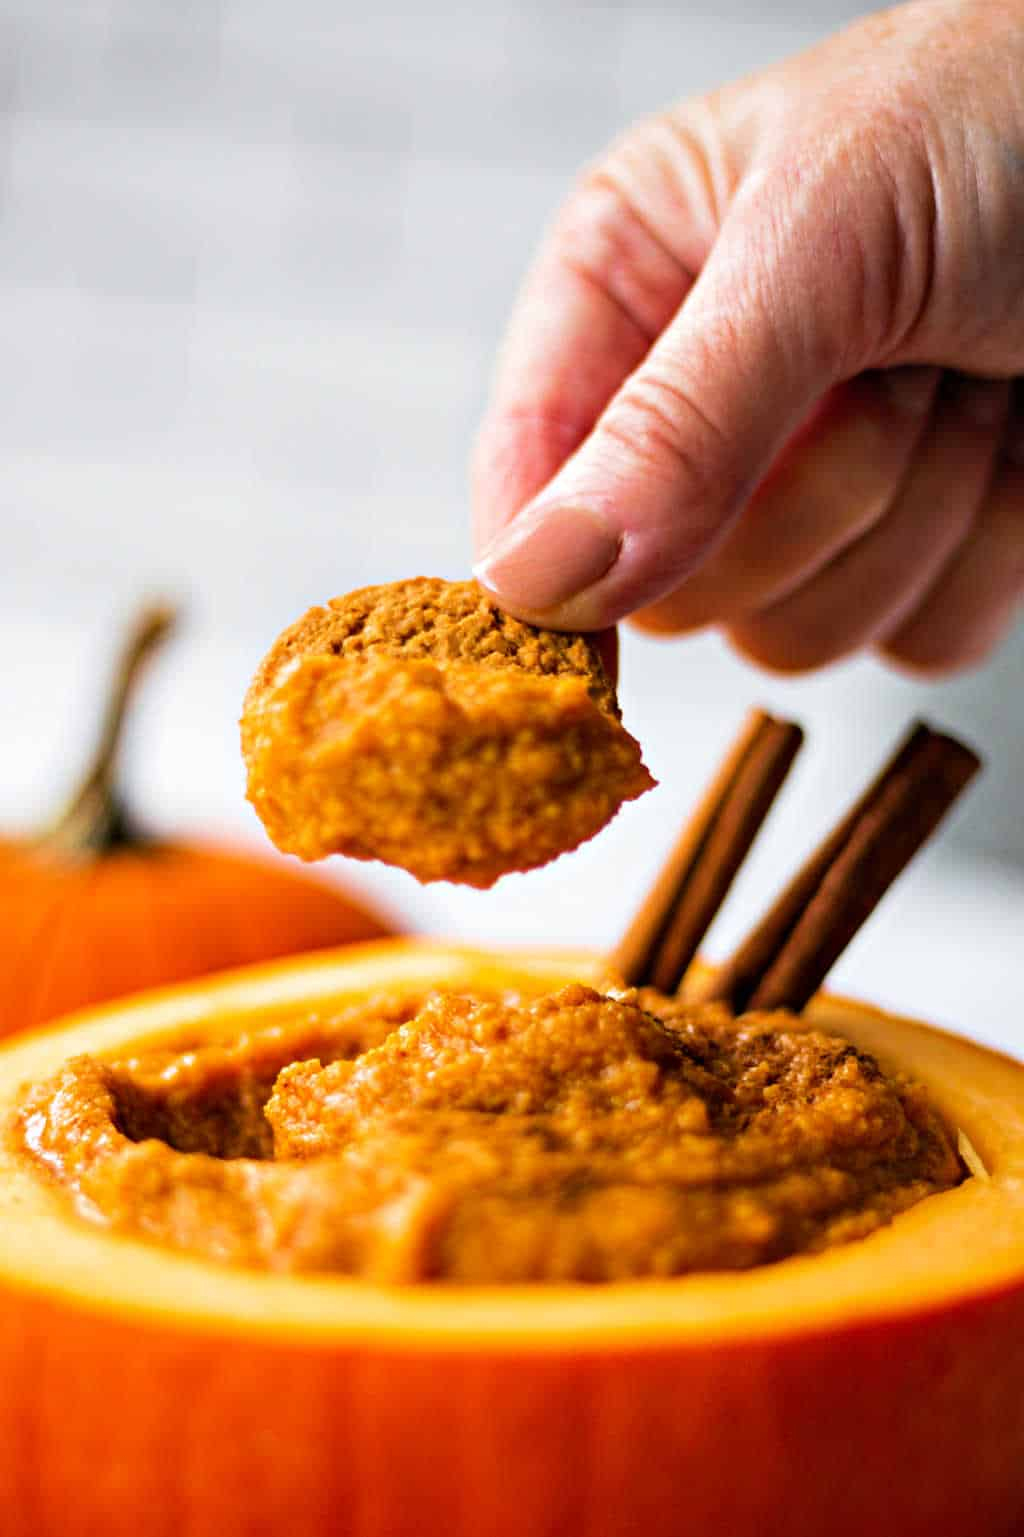 dipping a ginger snap into pumpkin mascarpone dip